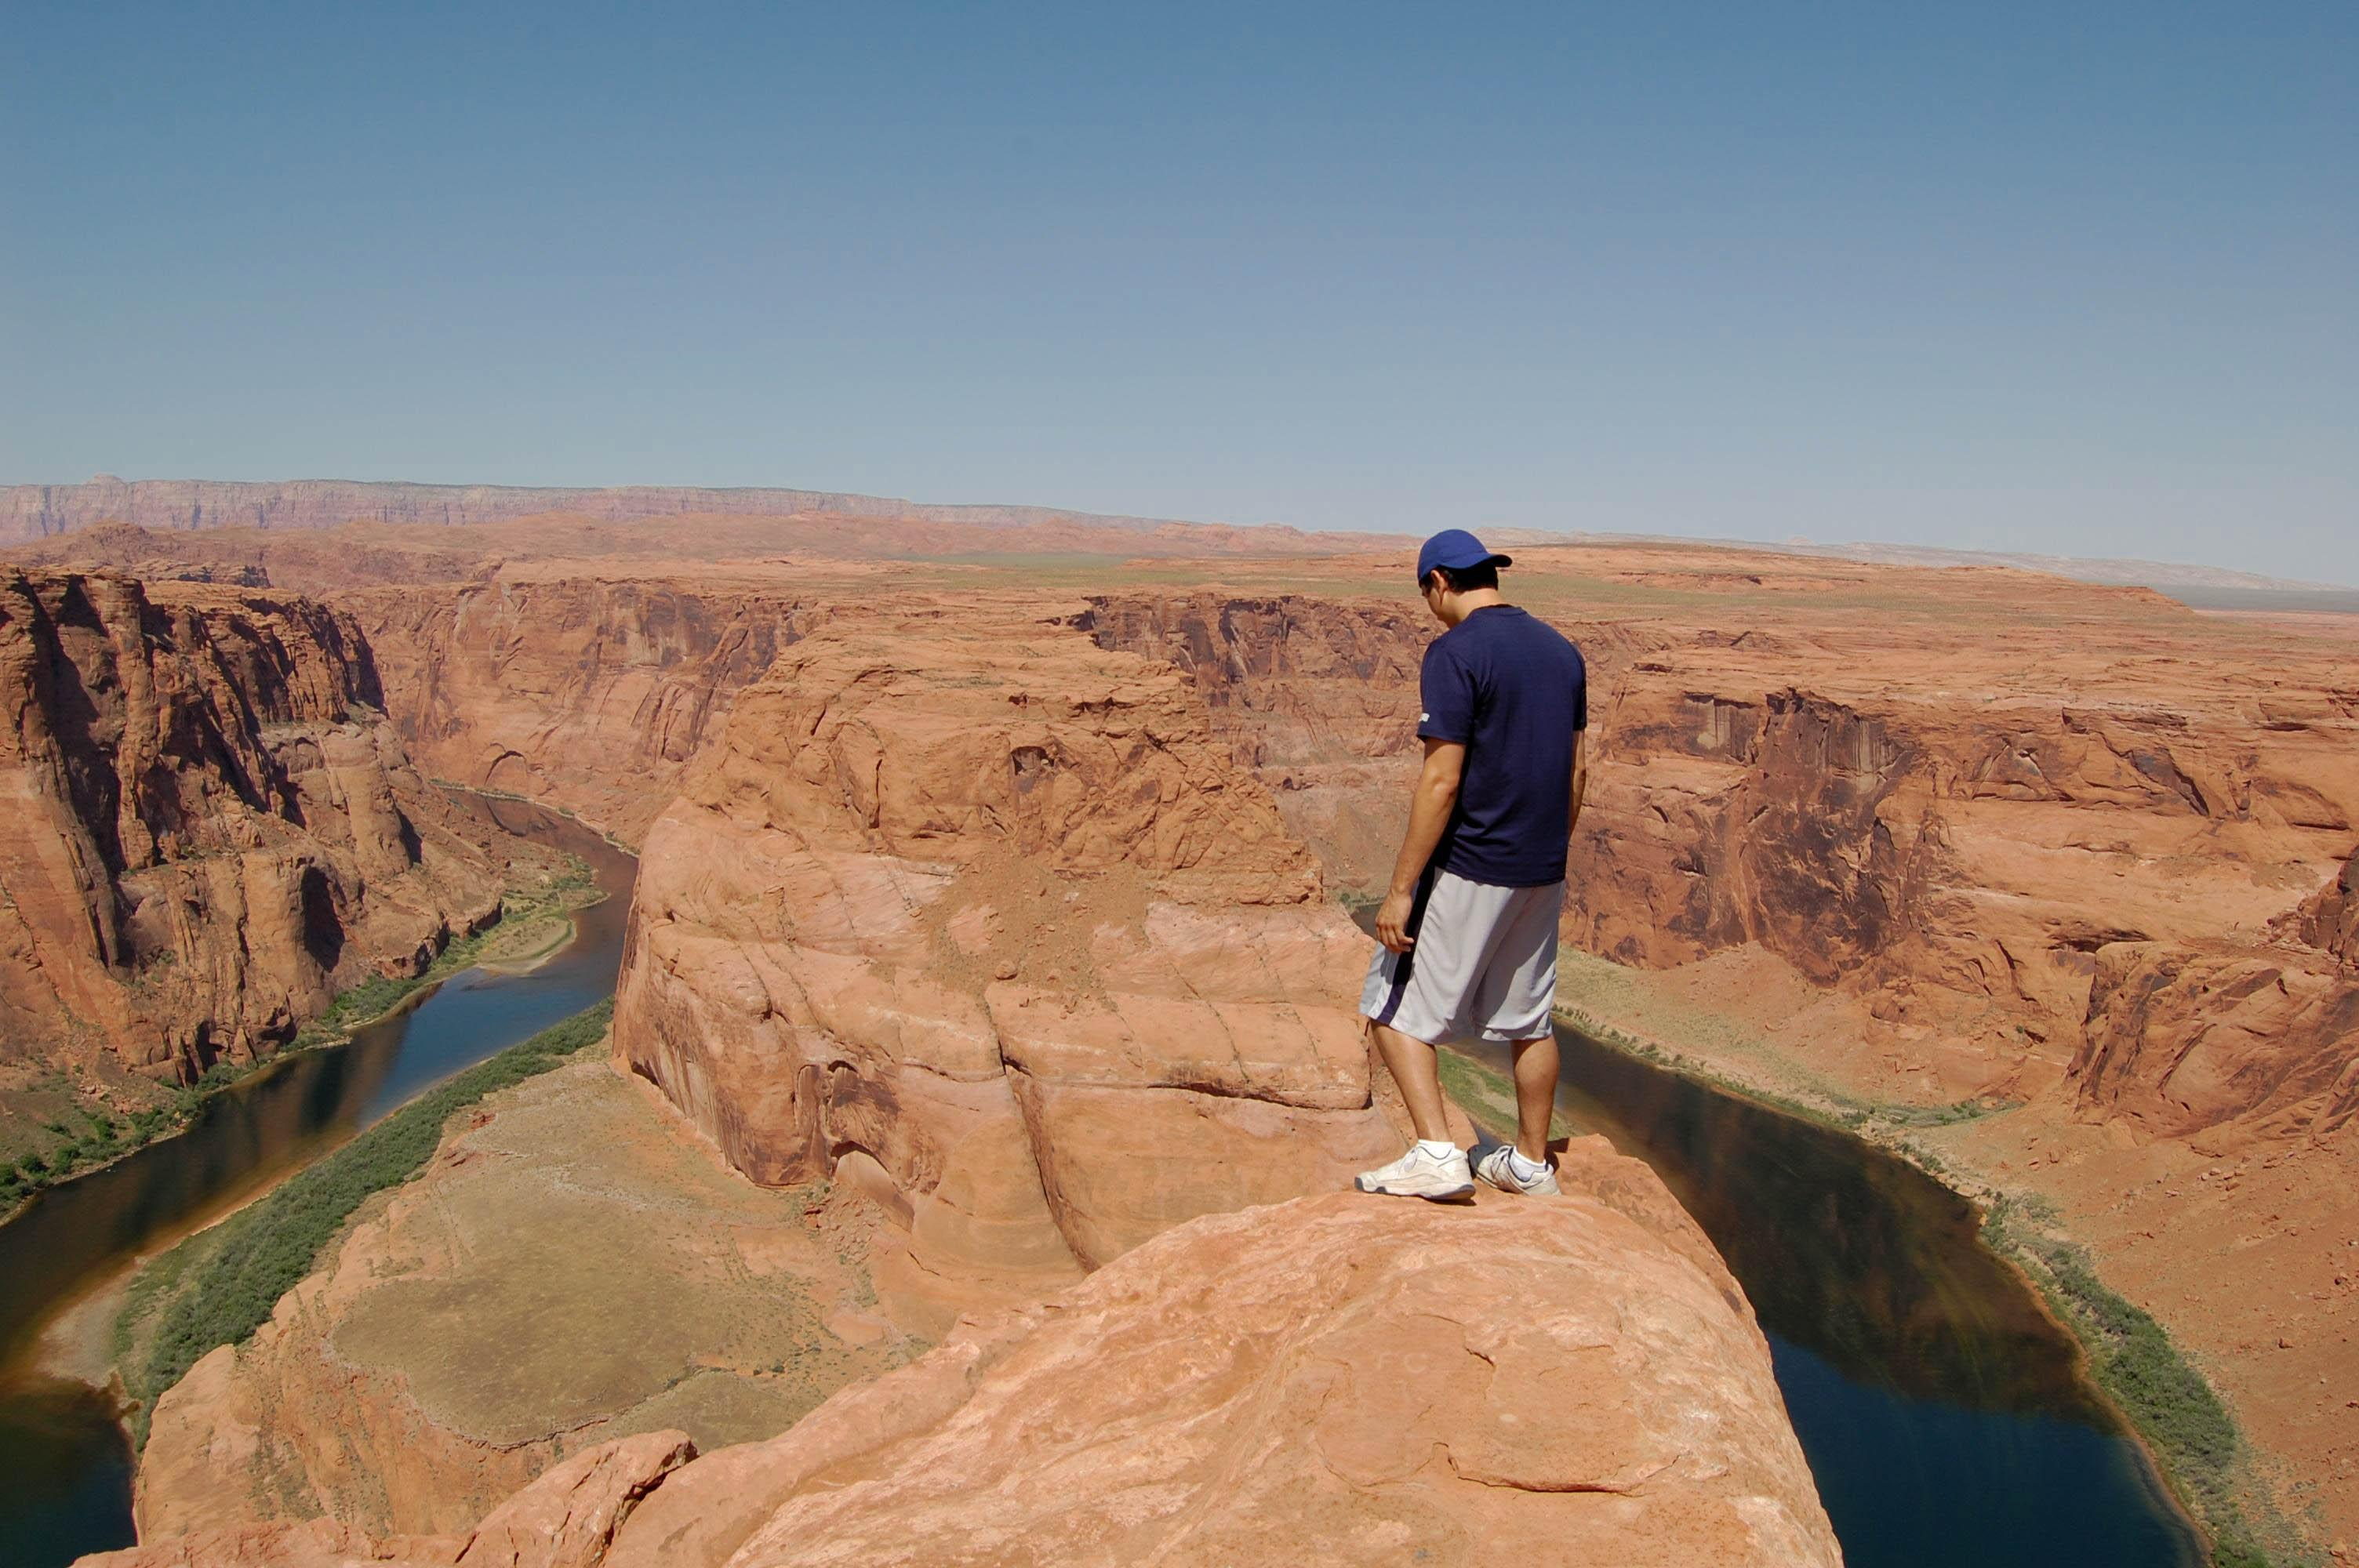 Gap Year Program - ARCC Gap | Southwest: Utah, Colorado, New Mexico, Arizona & California  4